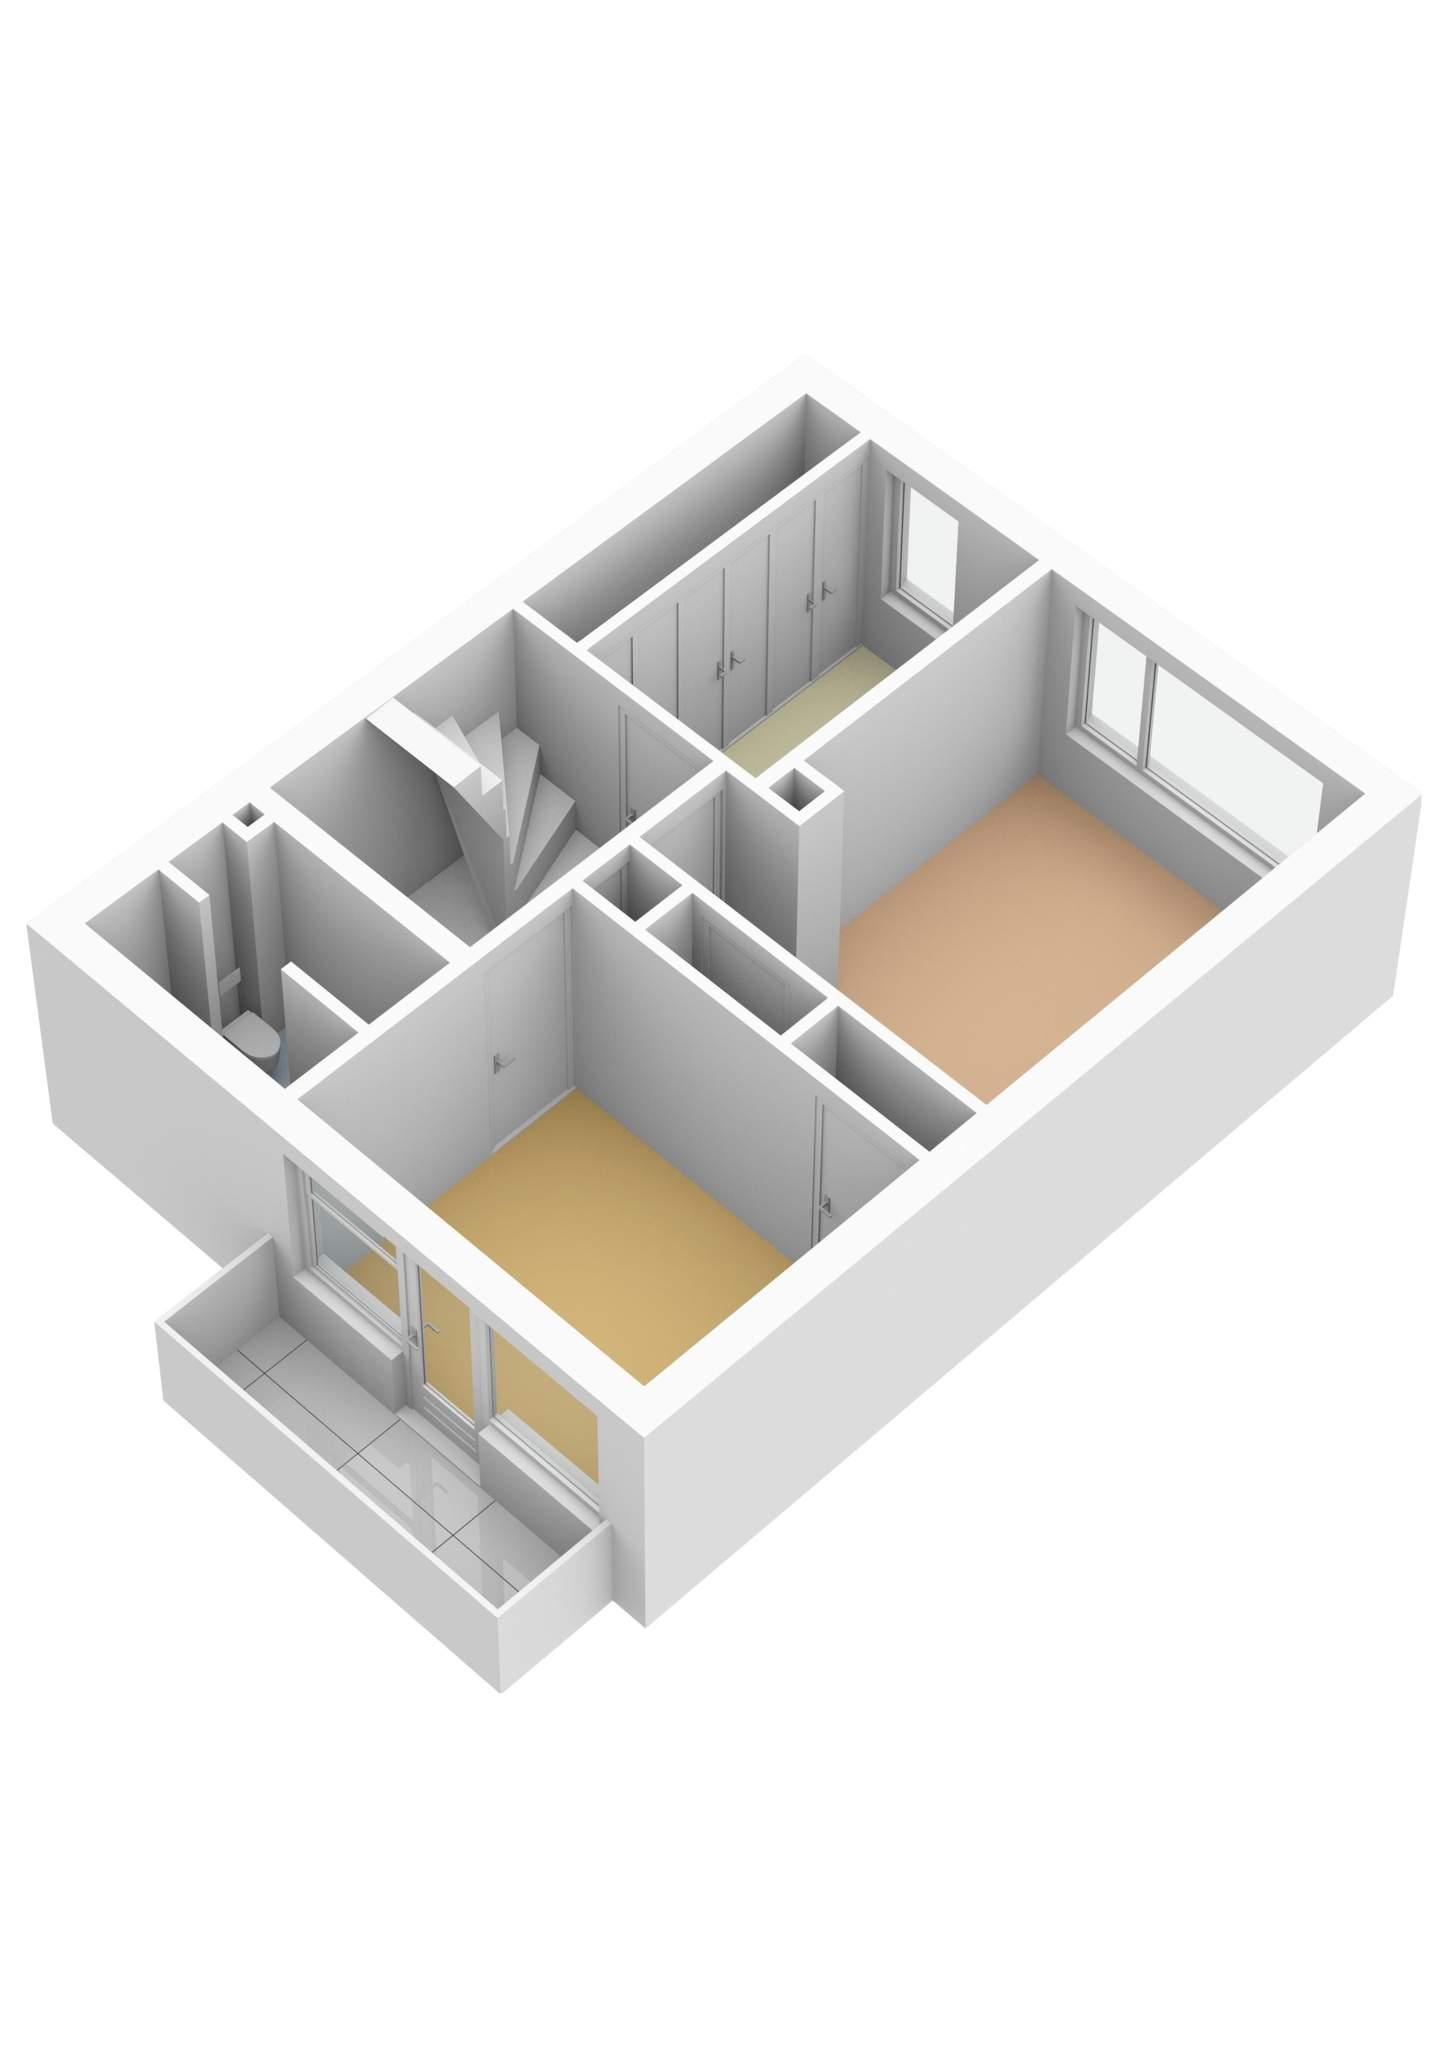 Ouderkerk aan de Amstel – Hogerlustlaan 8 – Plattegrond 4